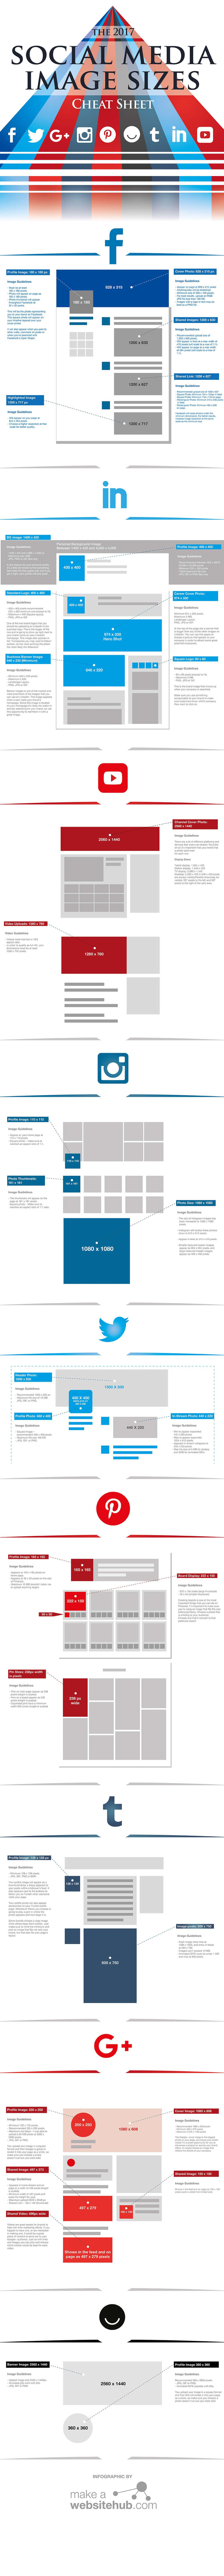 Der Social Media Bildergrößen Spickzettel 2017